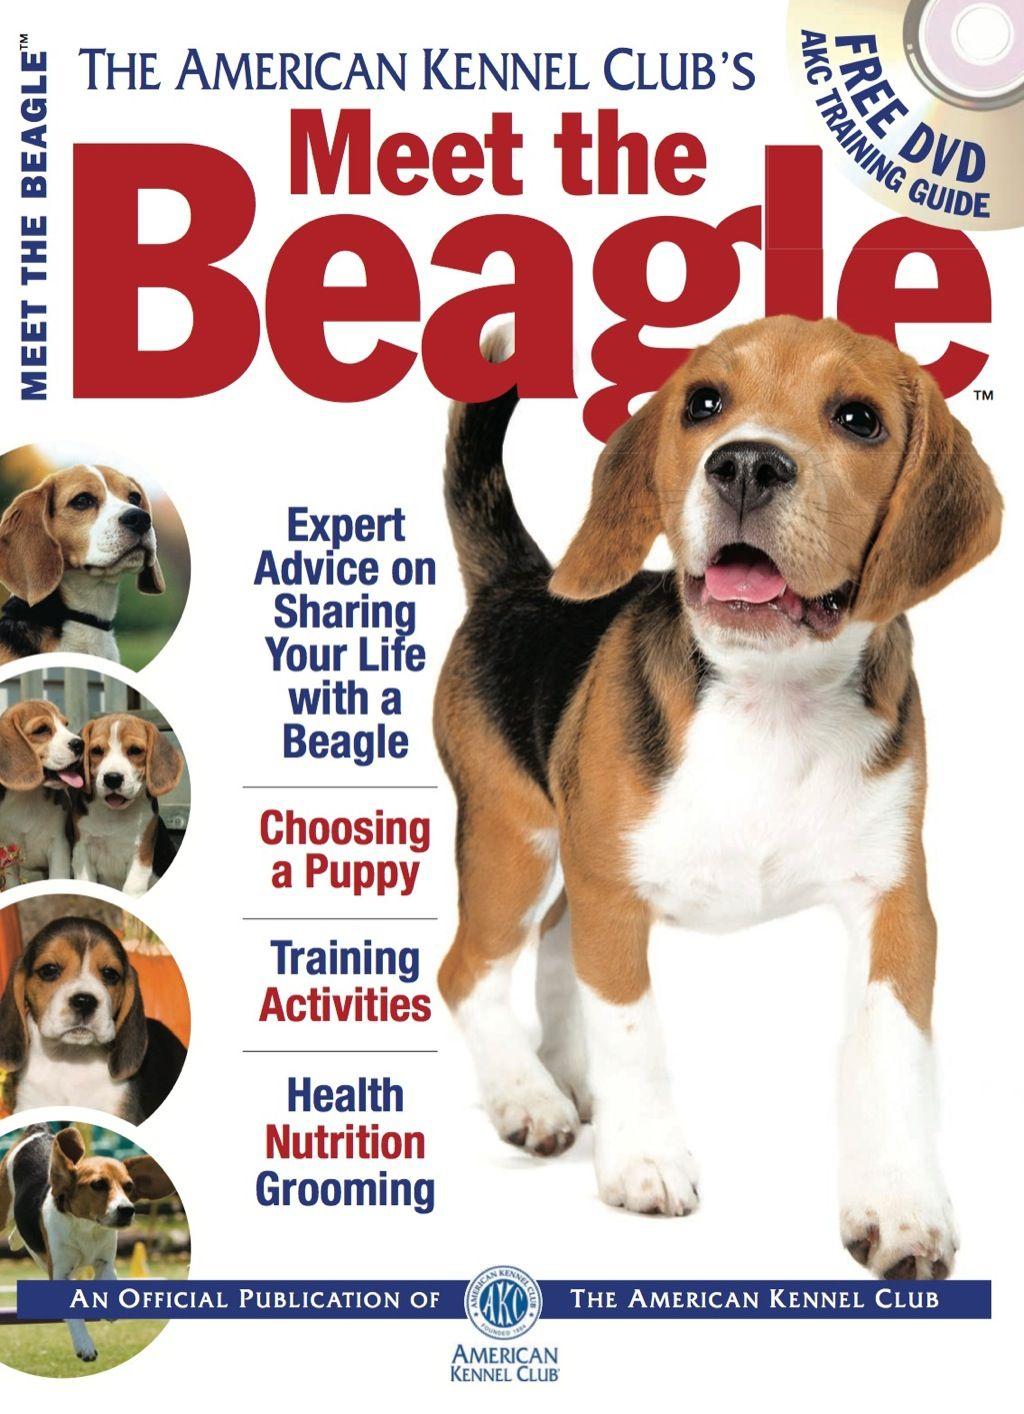 Meet The Beagle Ebook Beagle Train Activities Beagle Art